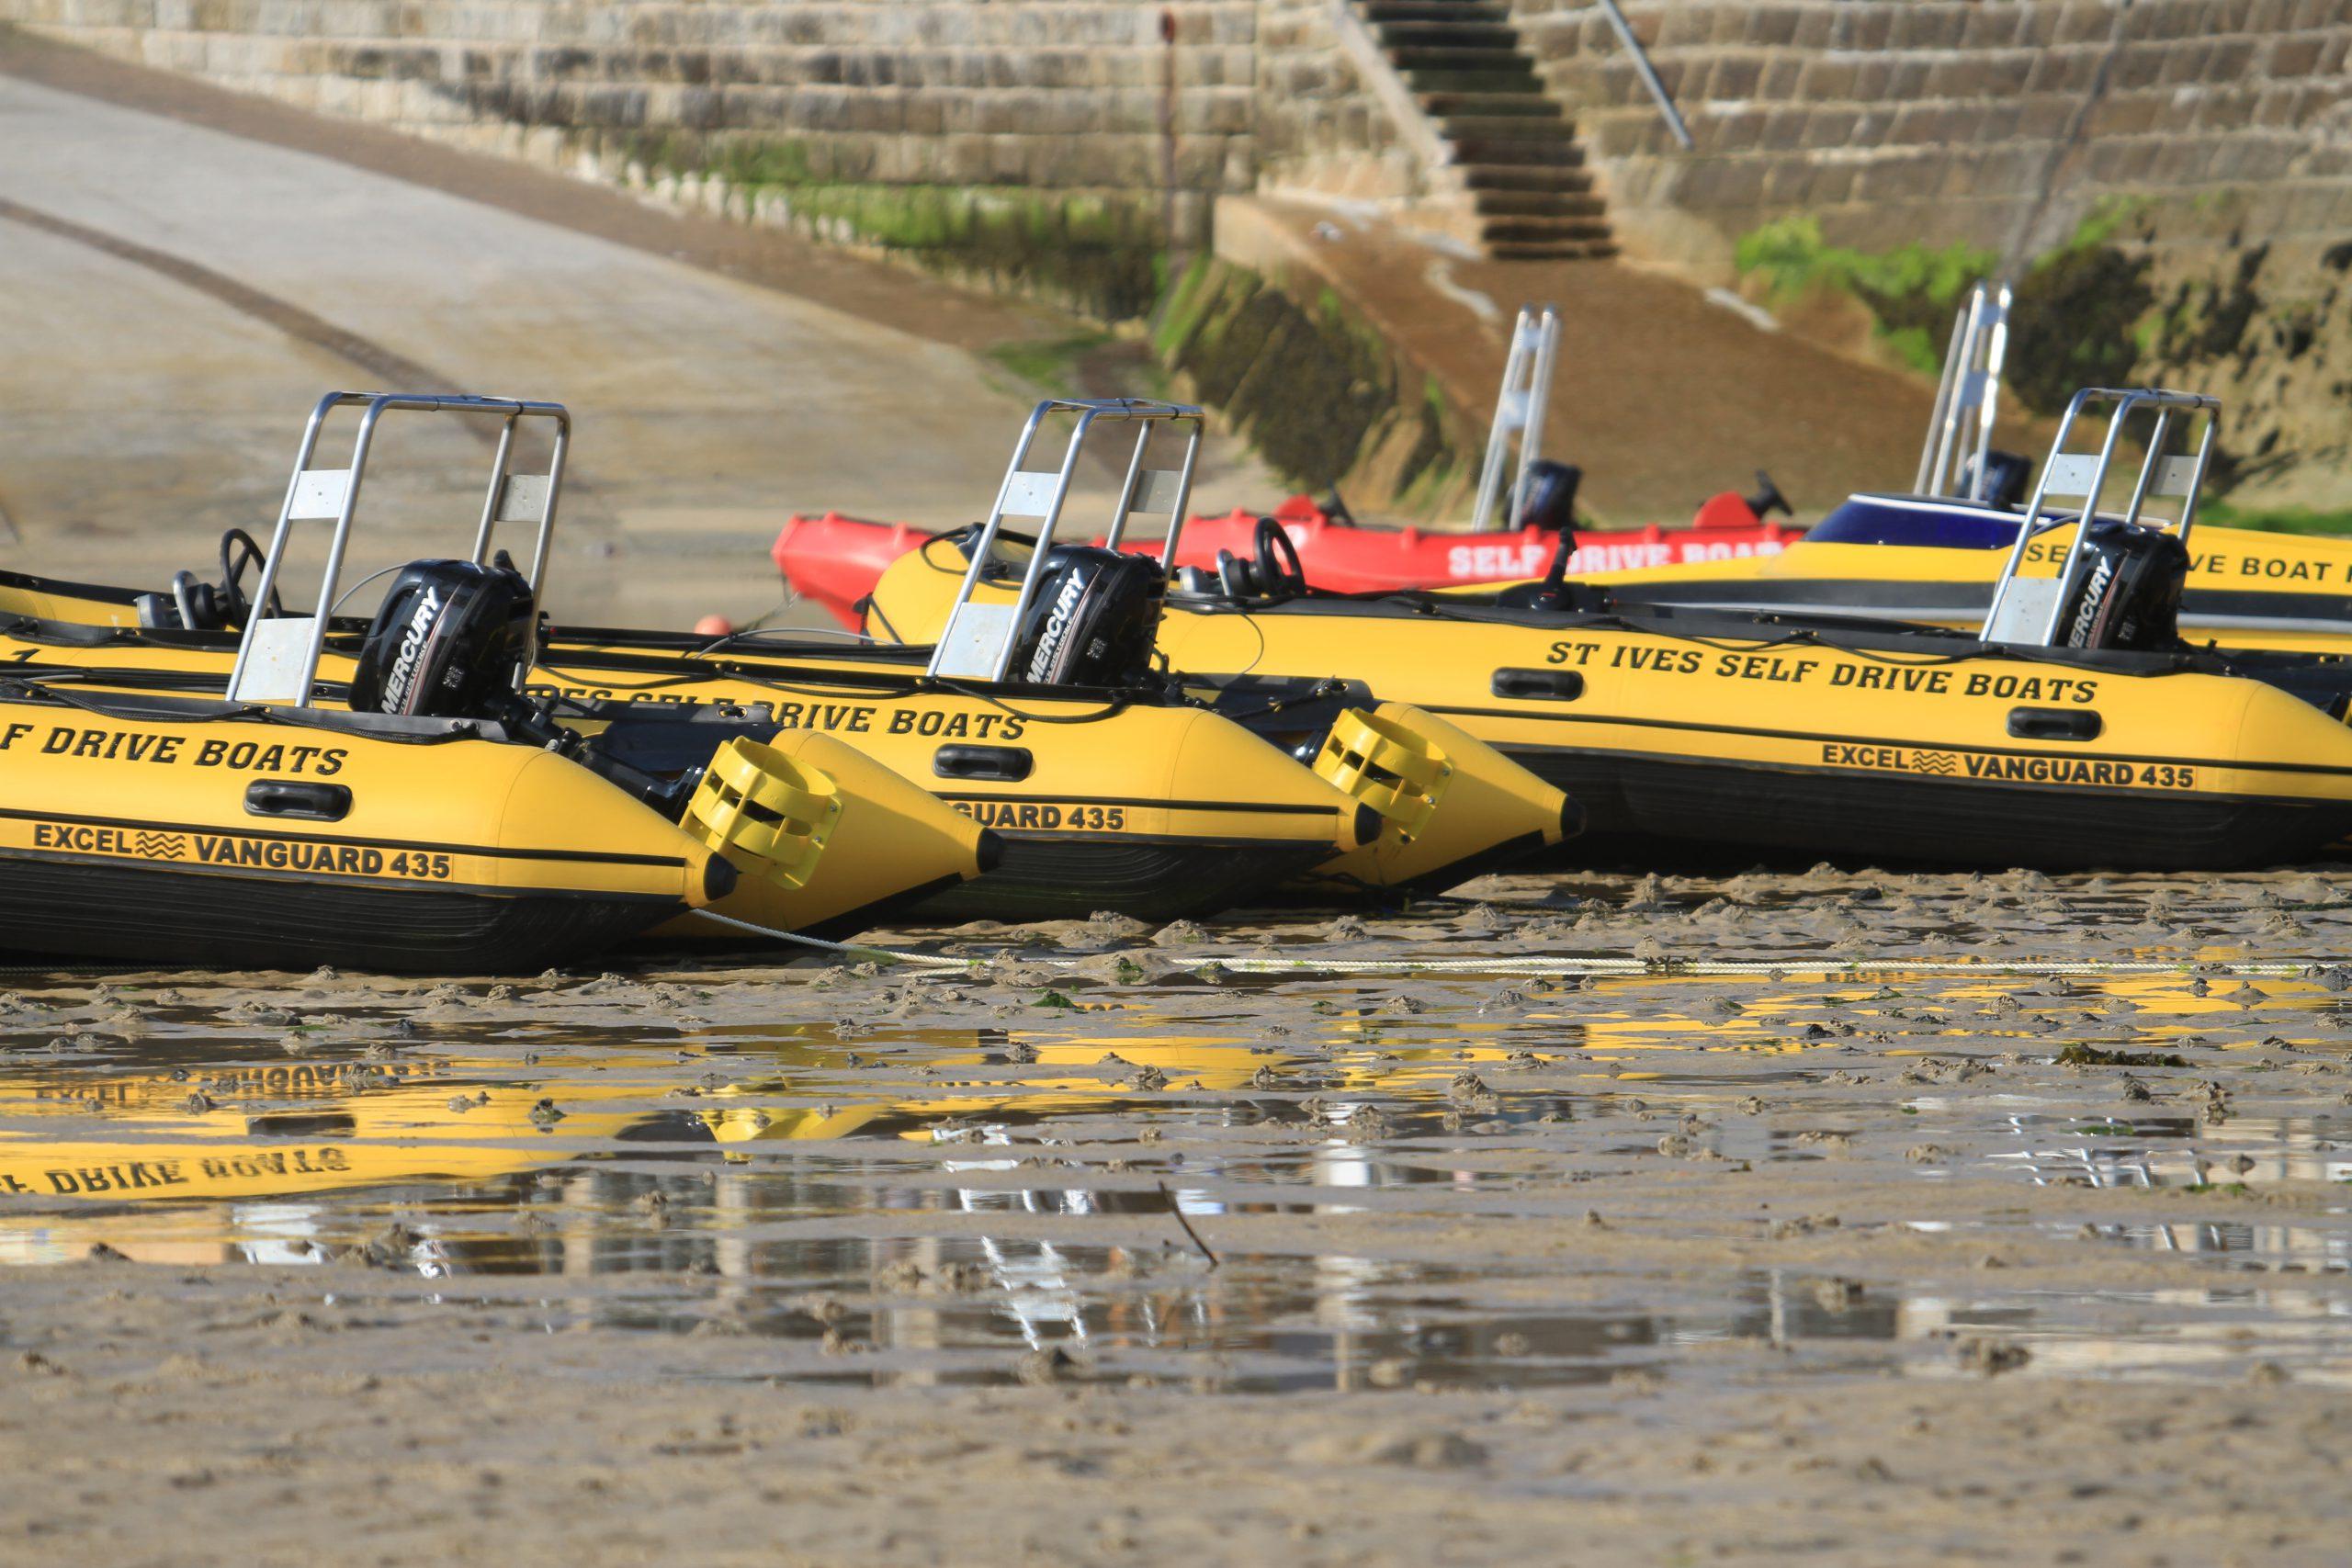 Self Drive Boats